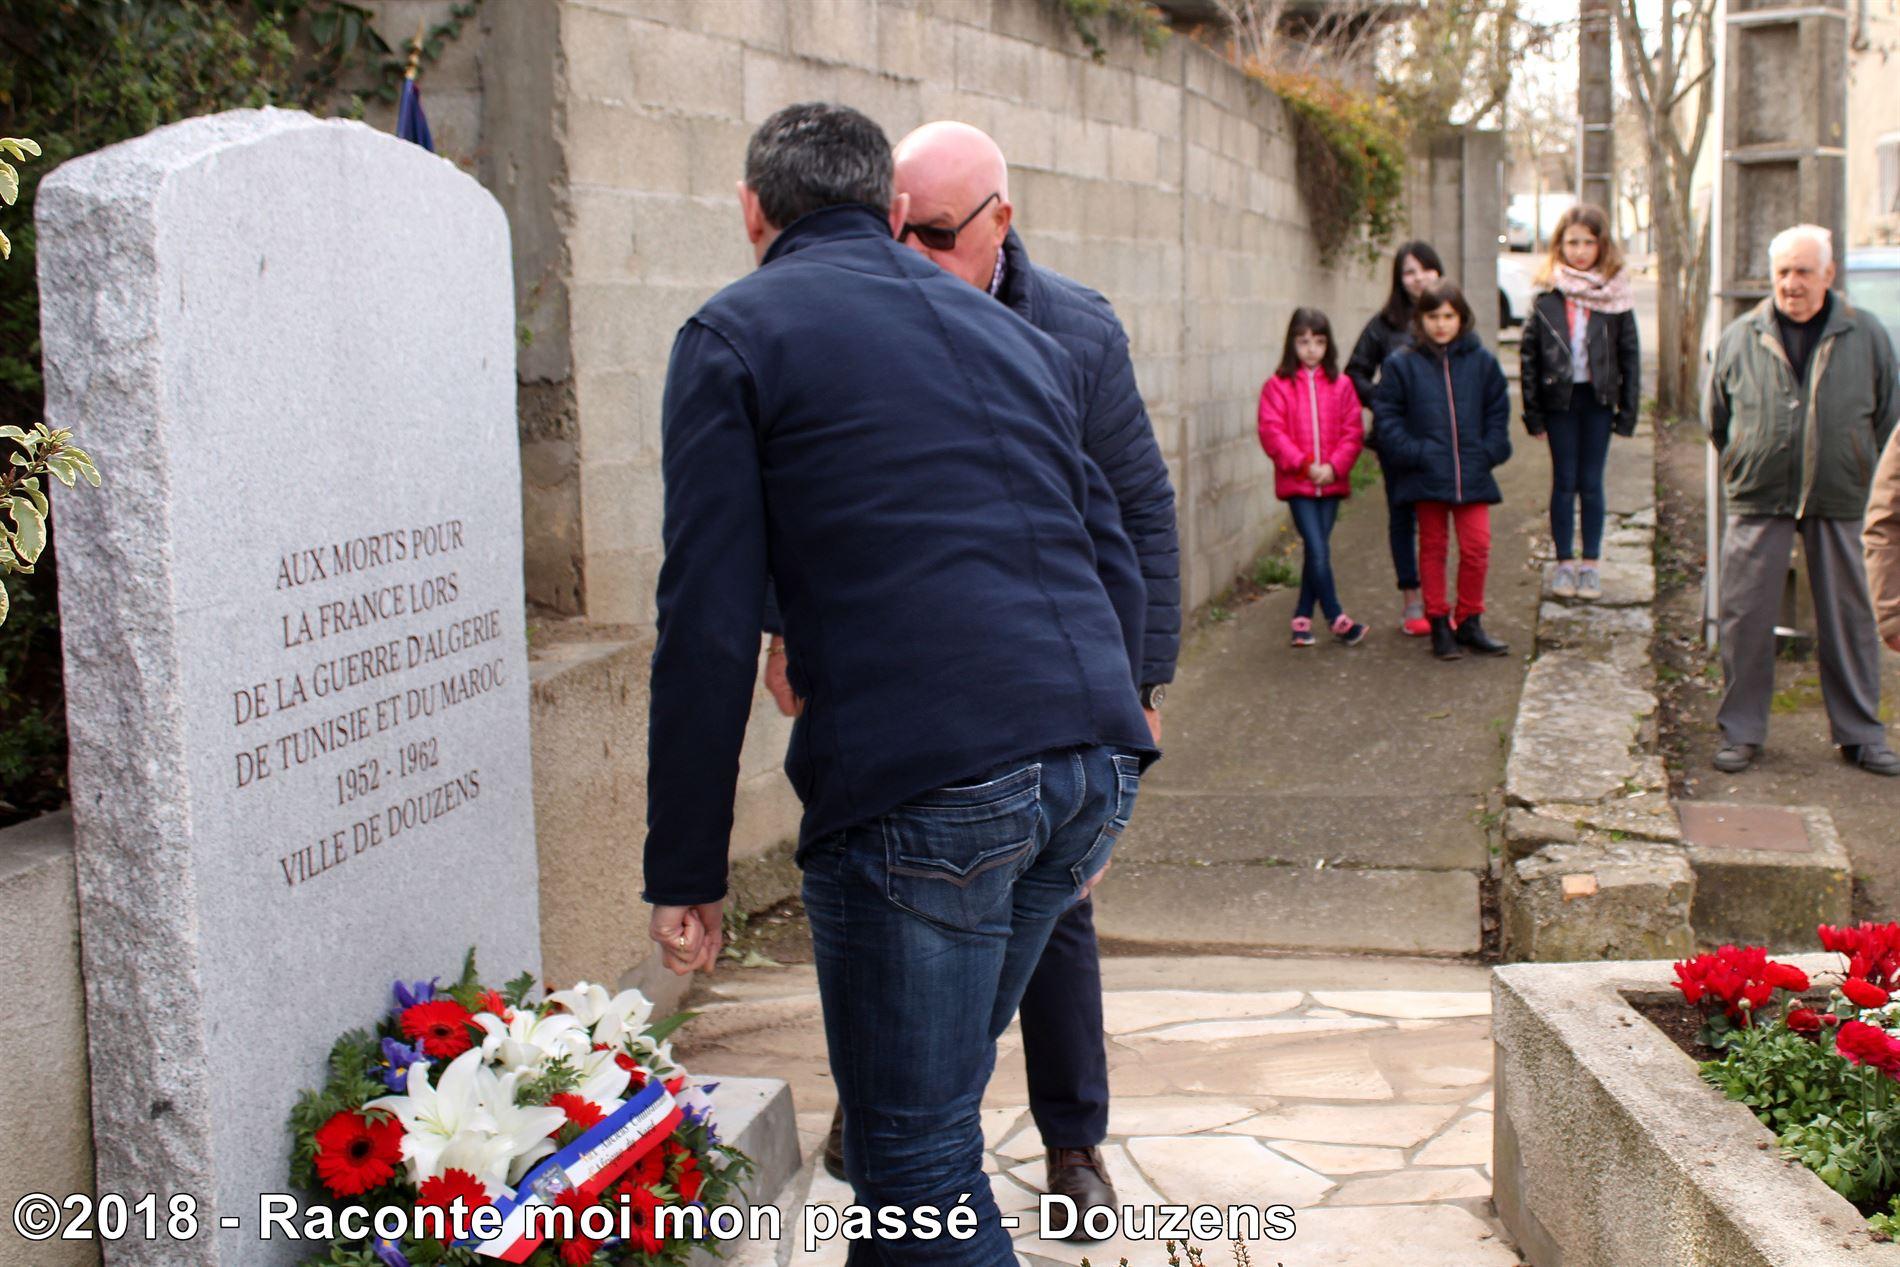 05 - 2018 - Commémoration 19 Mars 1965